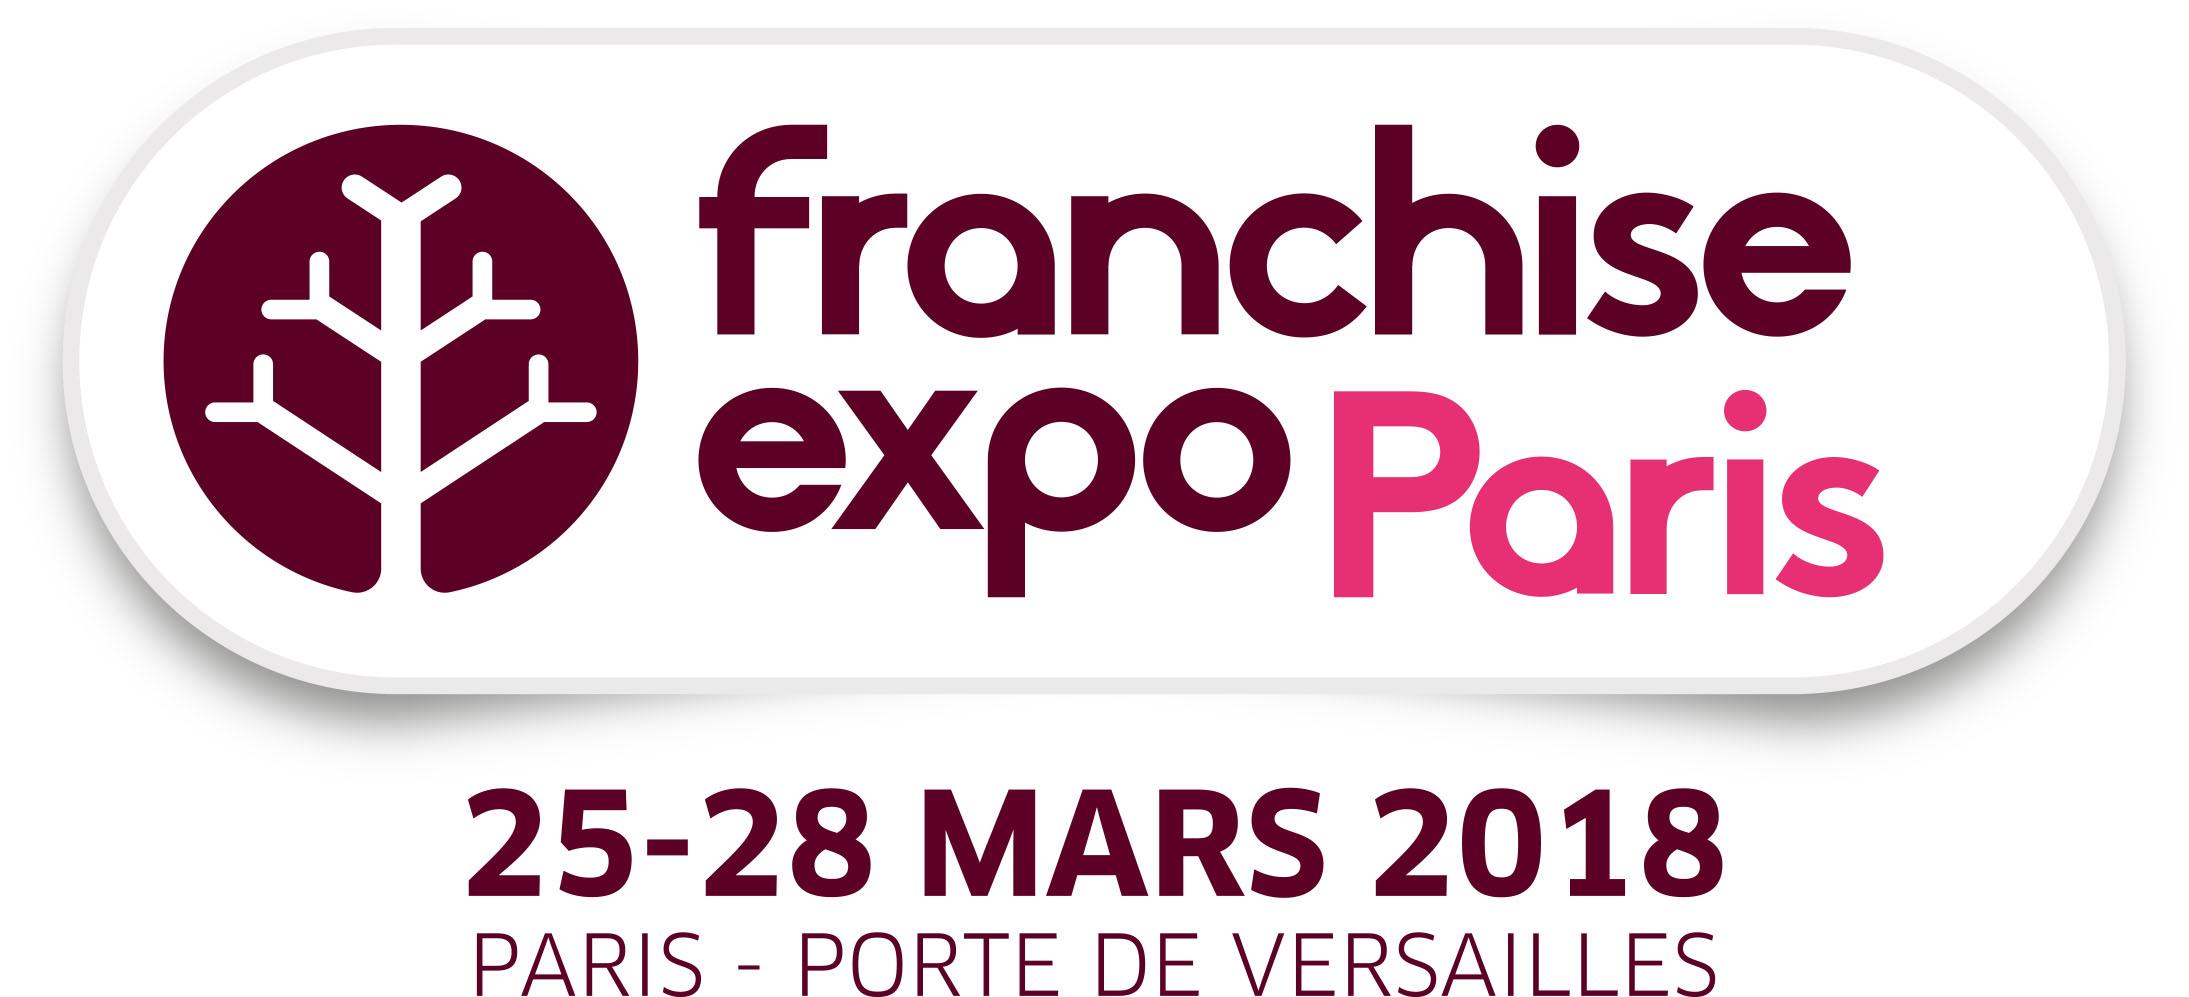 franchise logo_dates_quadri